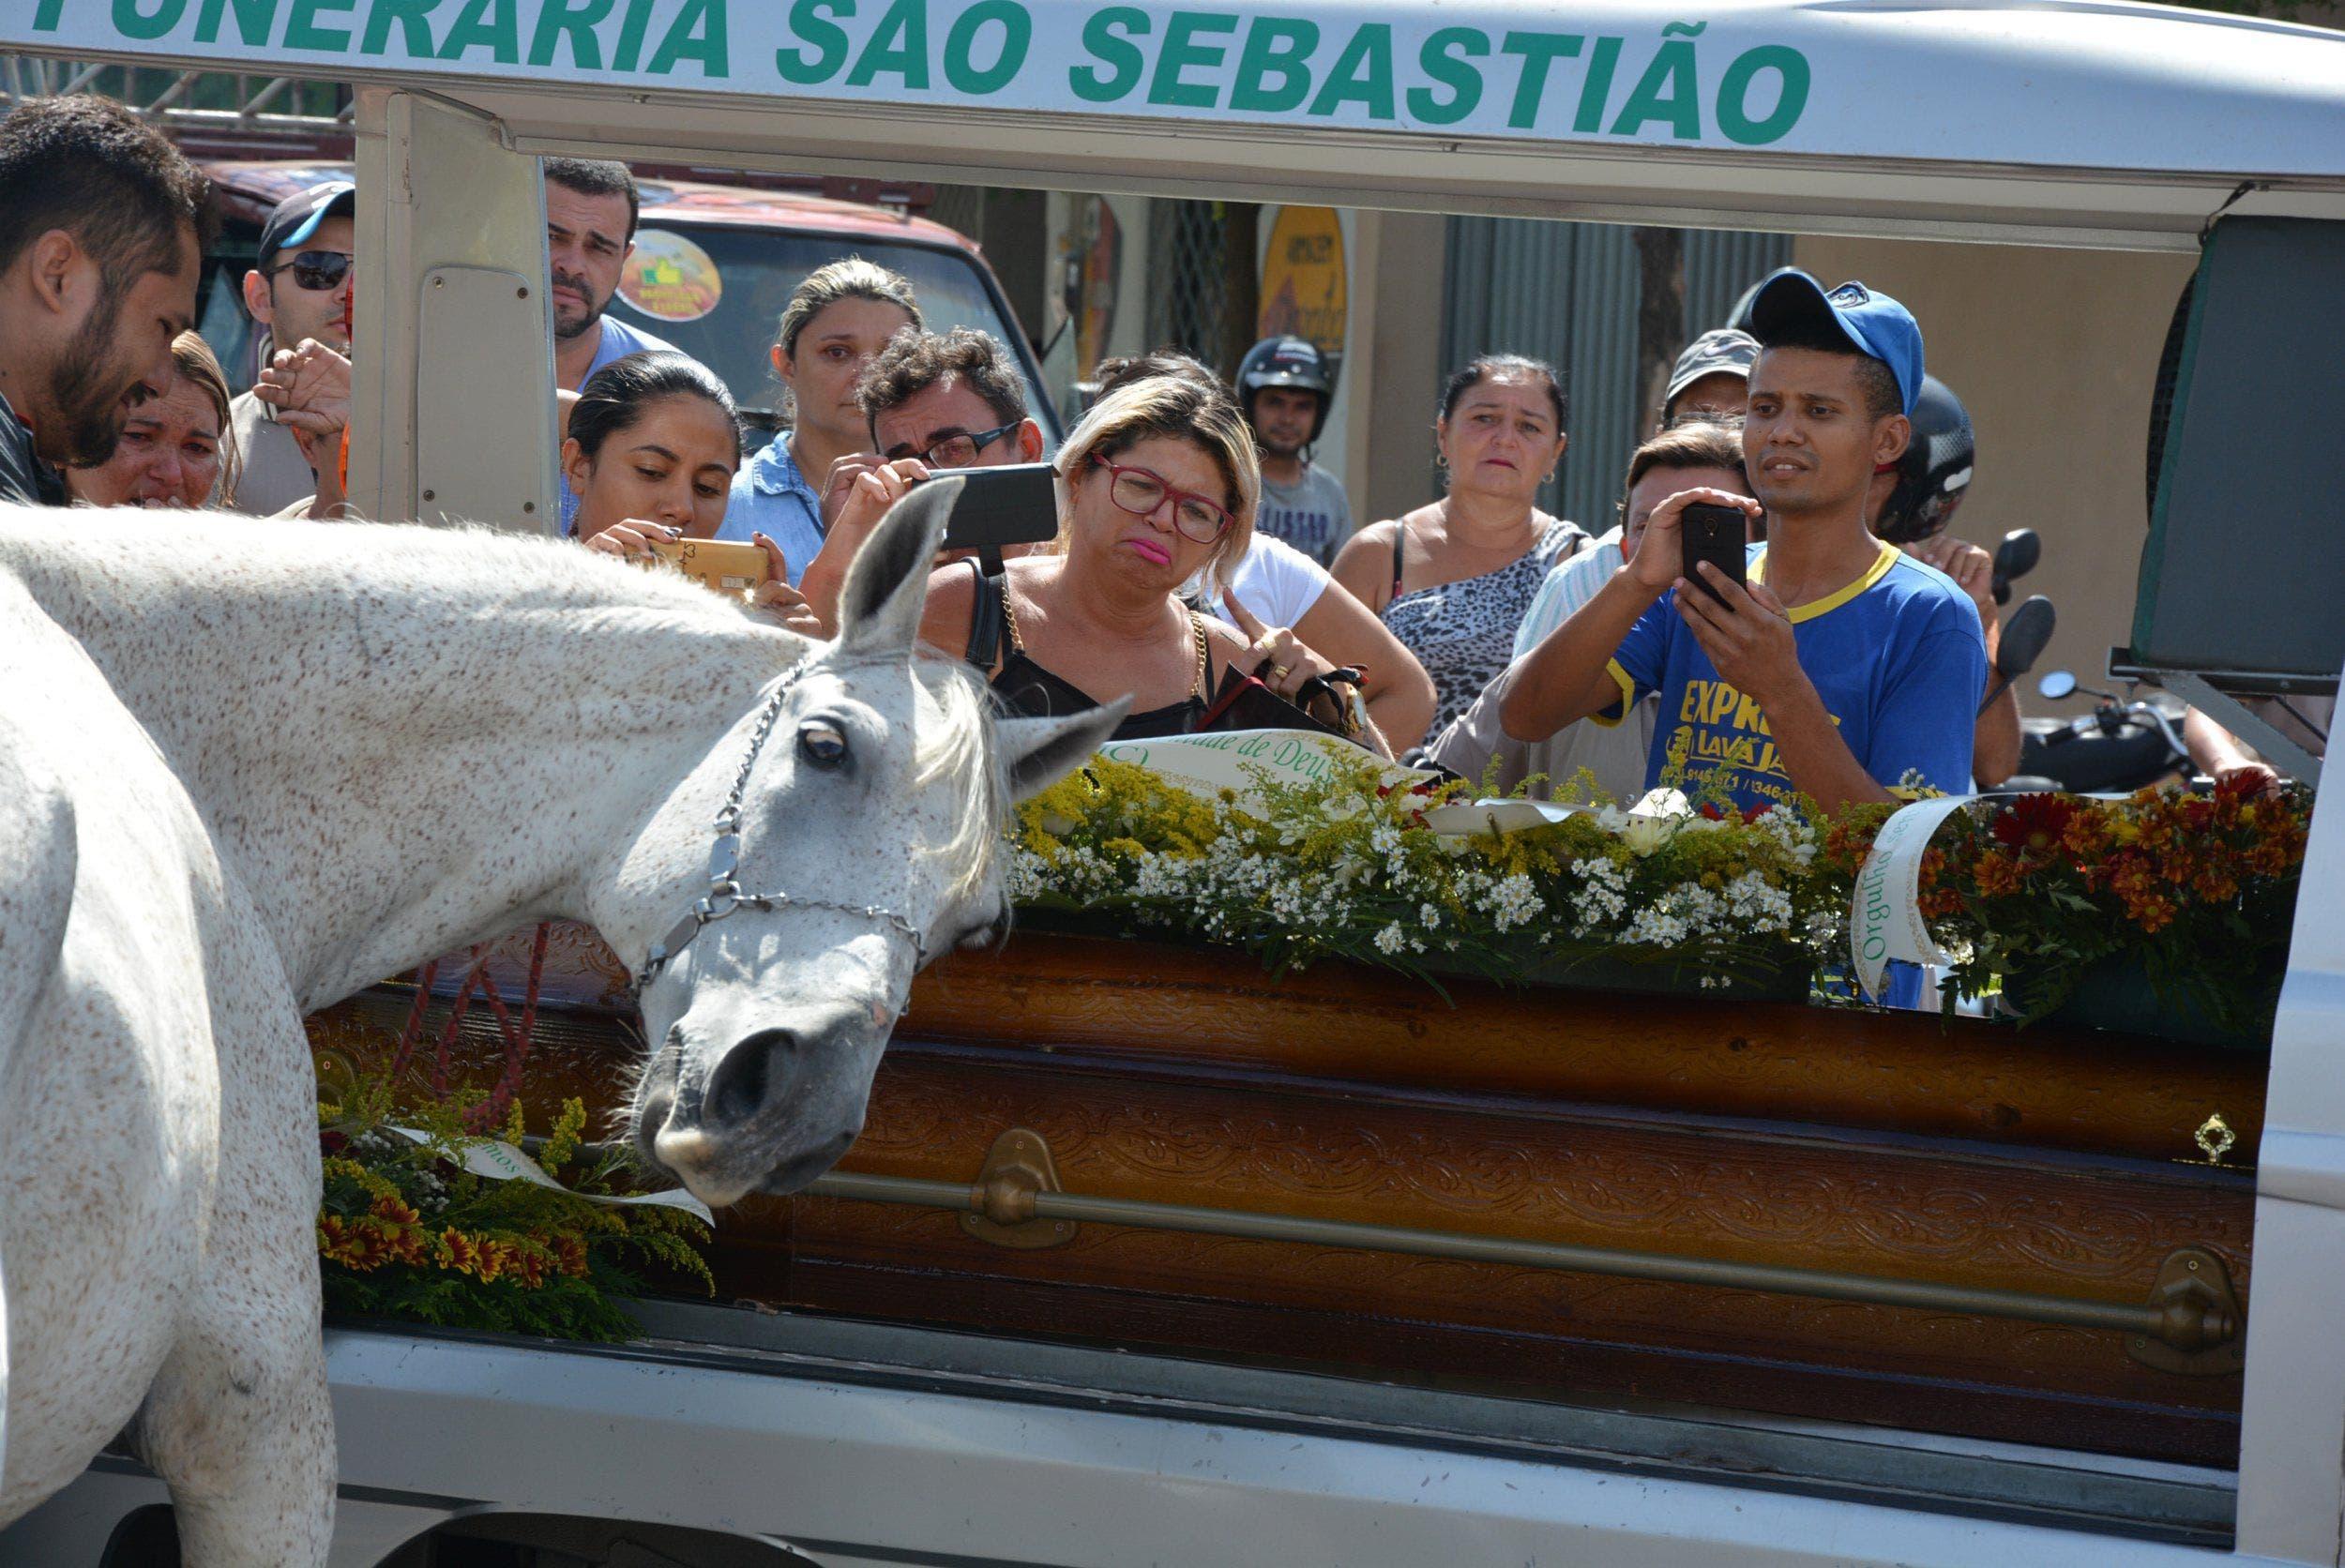 مؤثرة لحصان يبكي وفاة صاحبه 7cc8a608-f440-41fe-8a54-3c96e530cd71.jpg